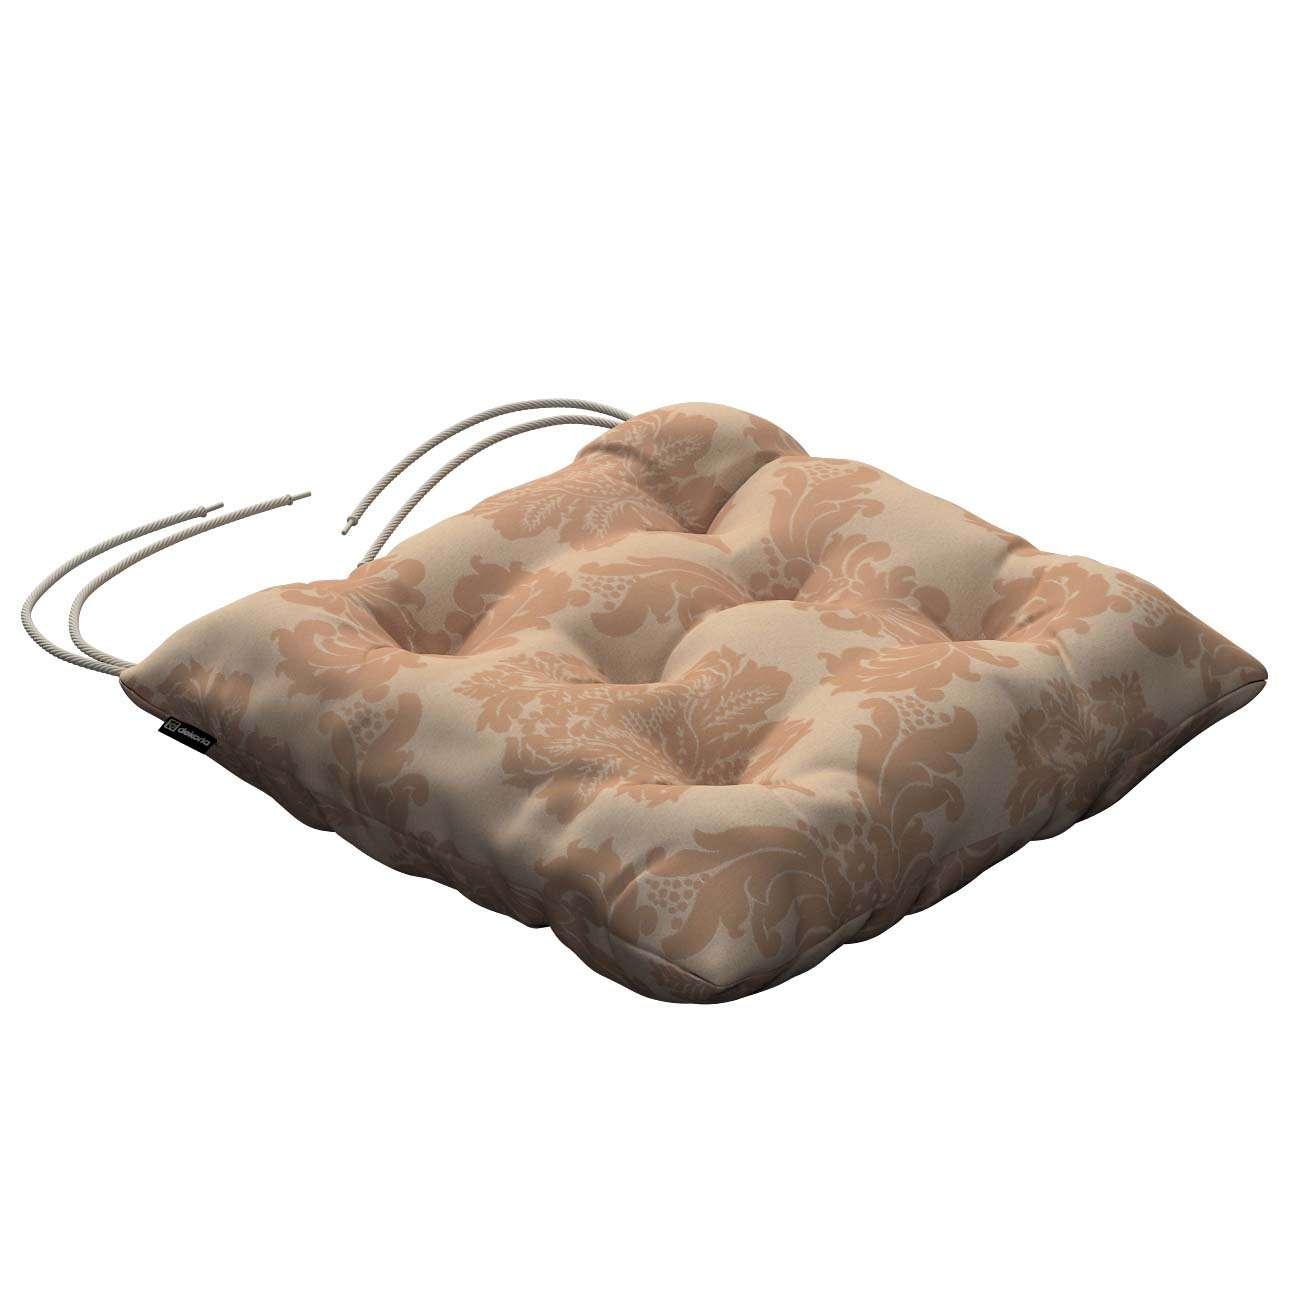 Kėdės pagalvėlė Jacek  40 x 40 x 8 cm kolekcijoje Damasco, audinys: 613-04